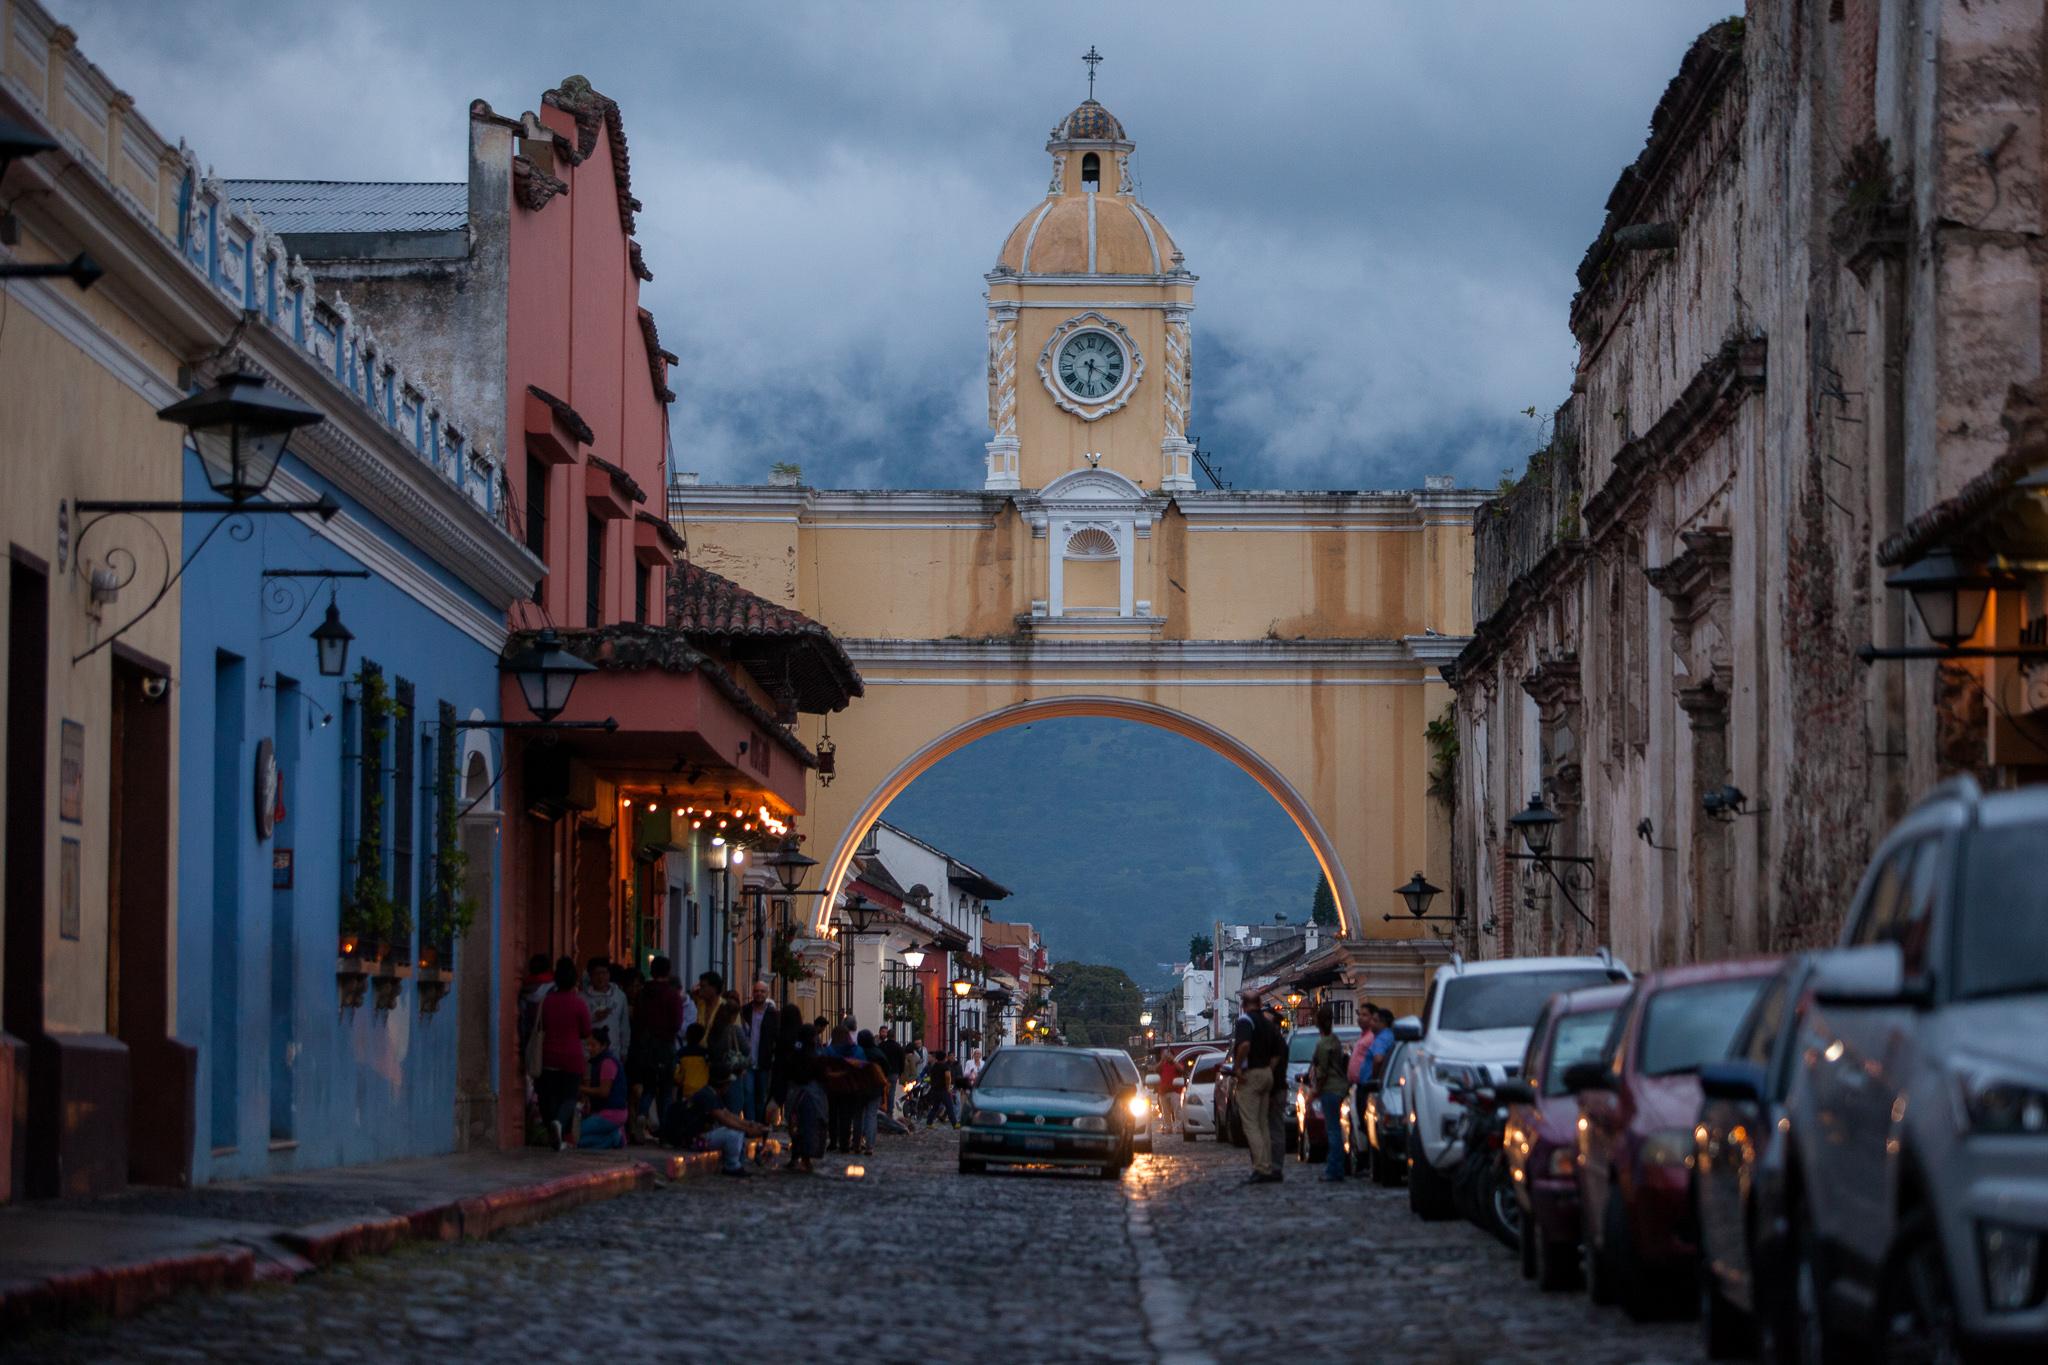 Guatemala-CP-160804-066.jpg